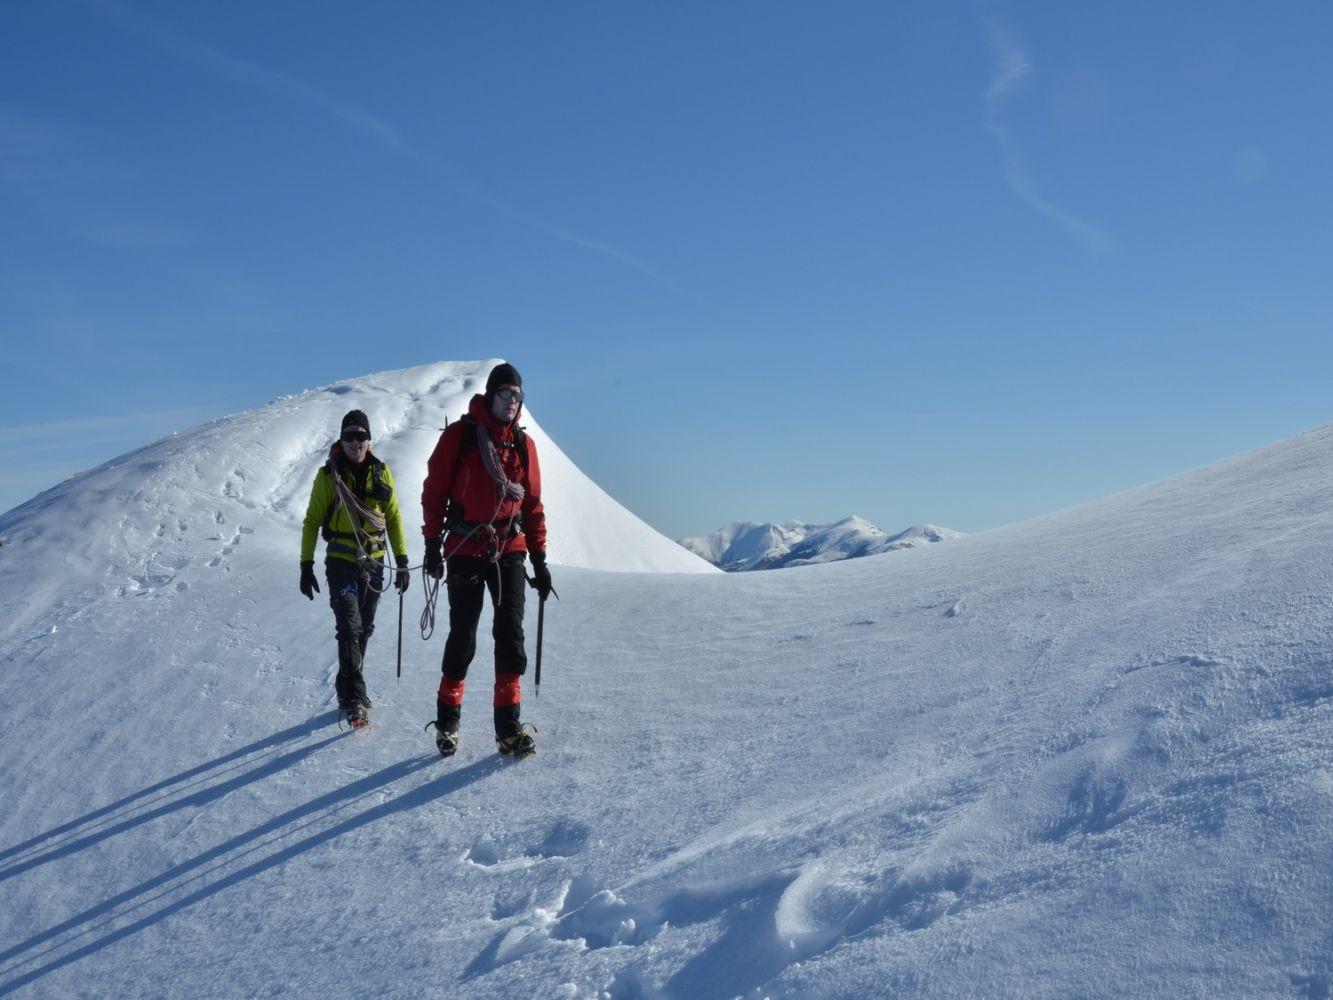 alpinisme_hiver_afdv_38